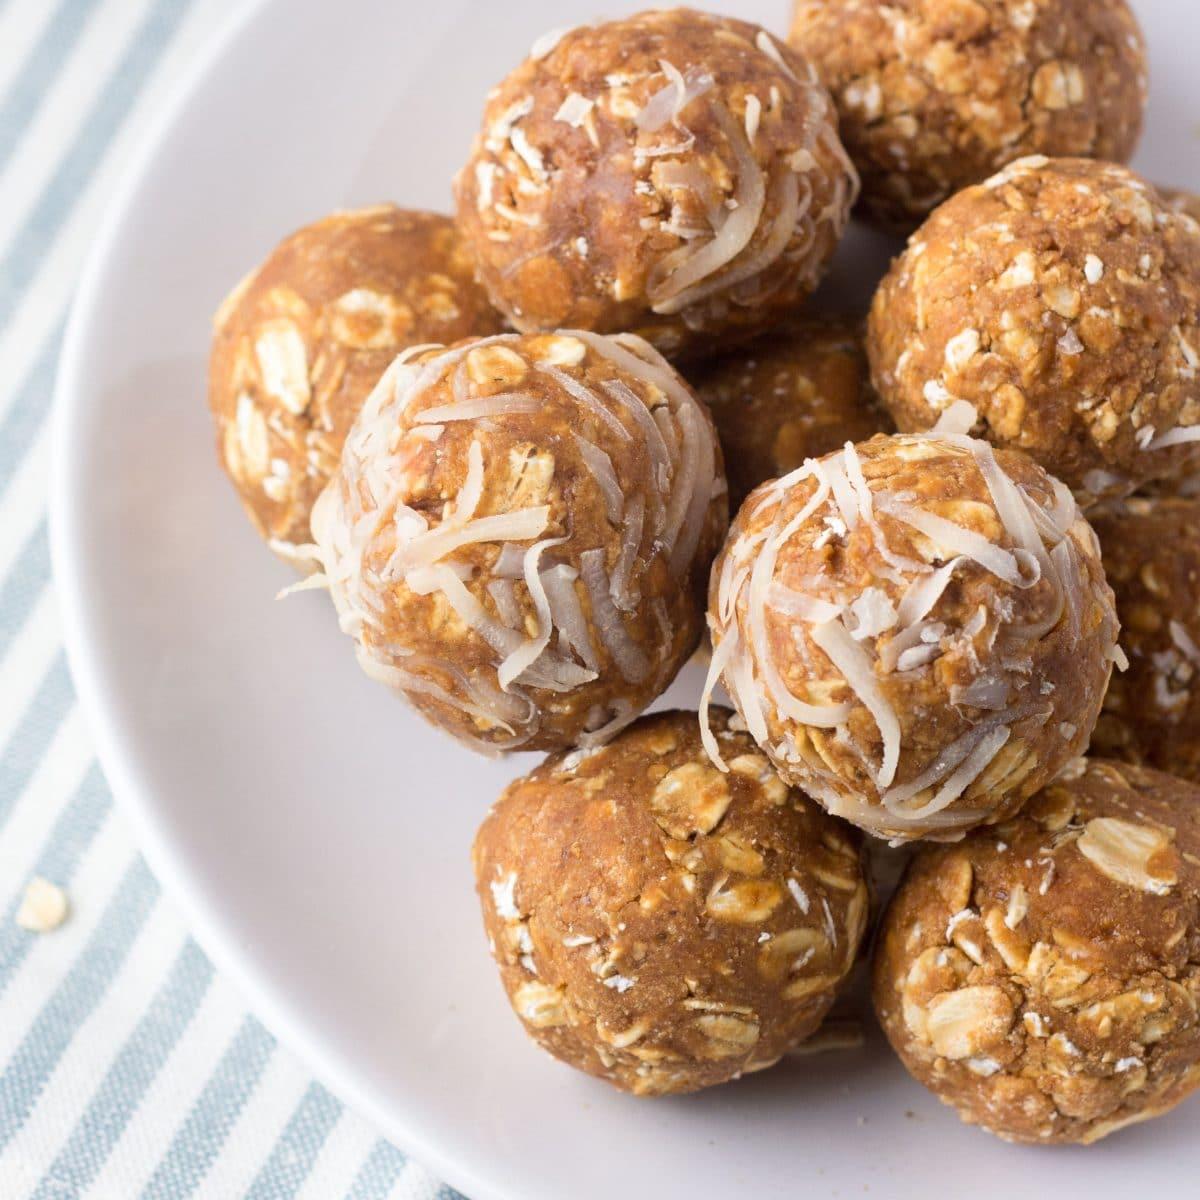 Peanut Butter Protein Balls 9 Grams Protein Each